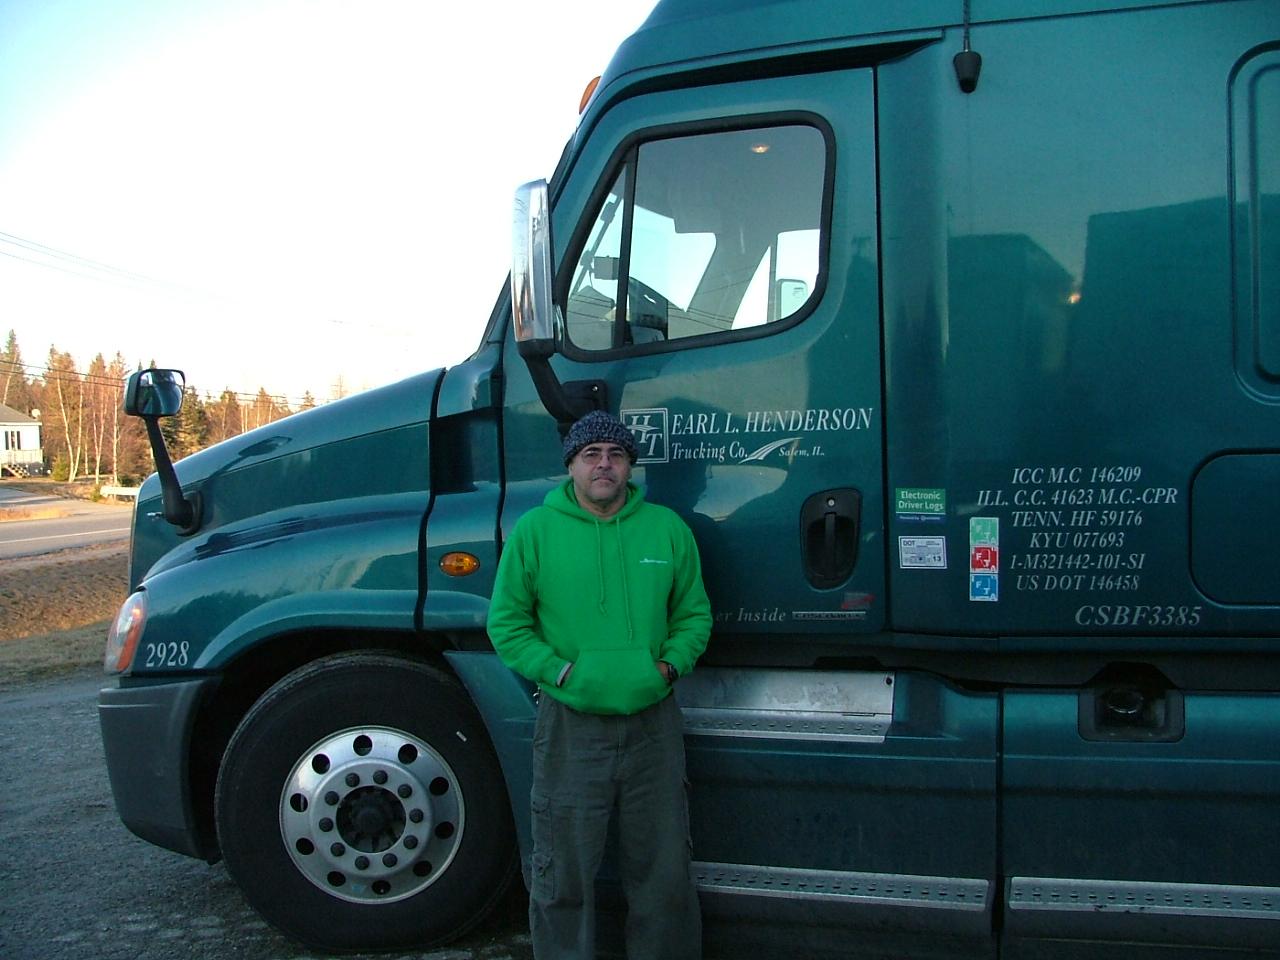 EARL L HENDERSON TRUCK & DRIVER.JPG